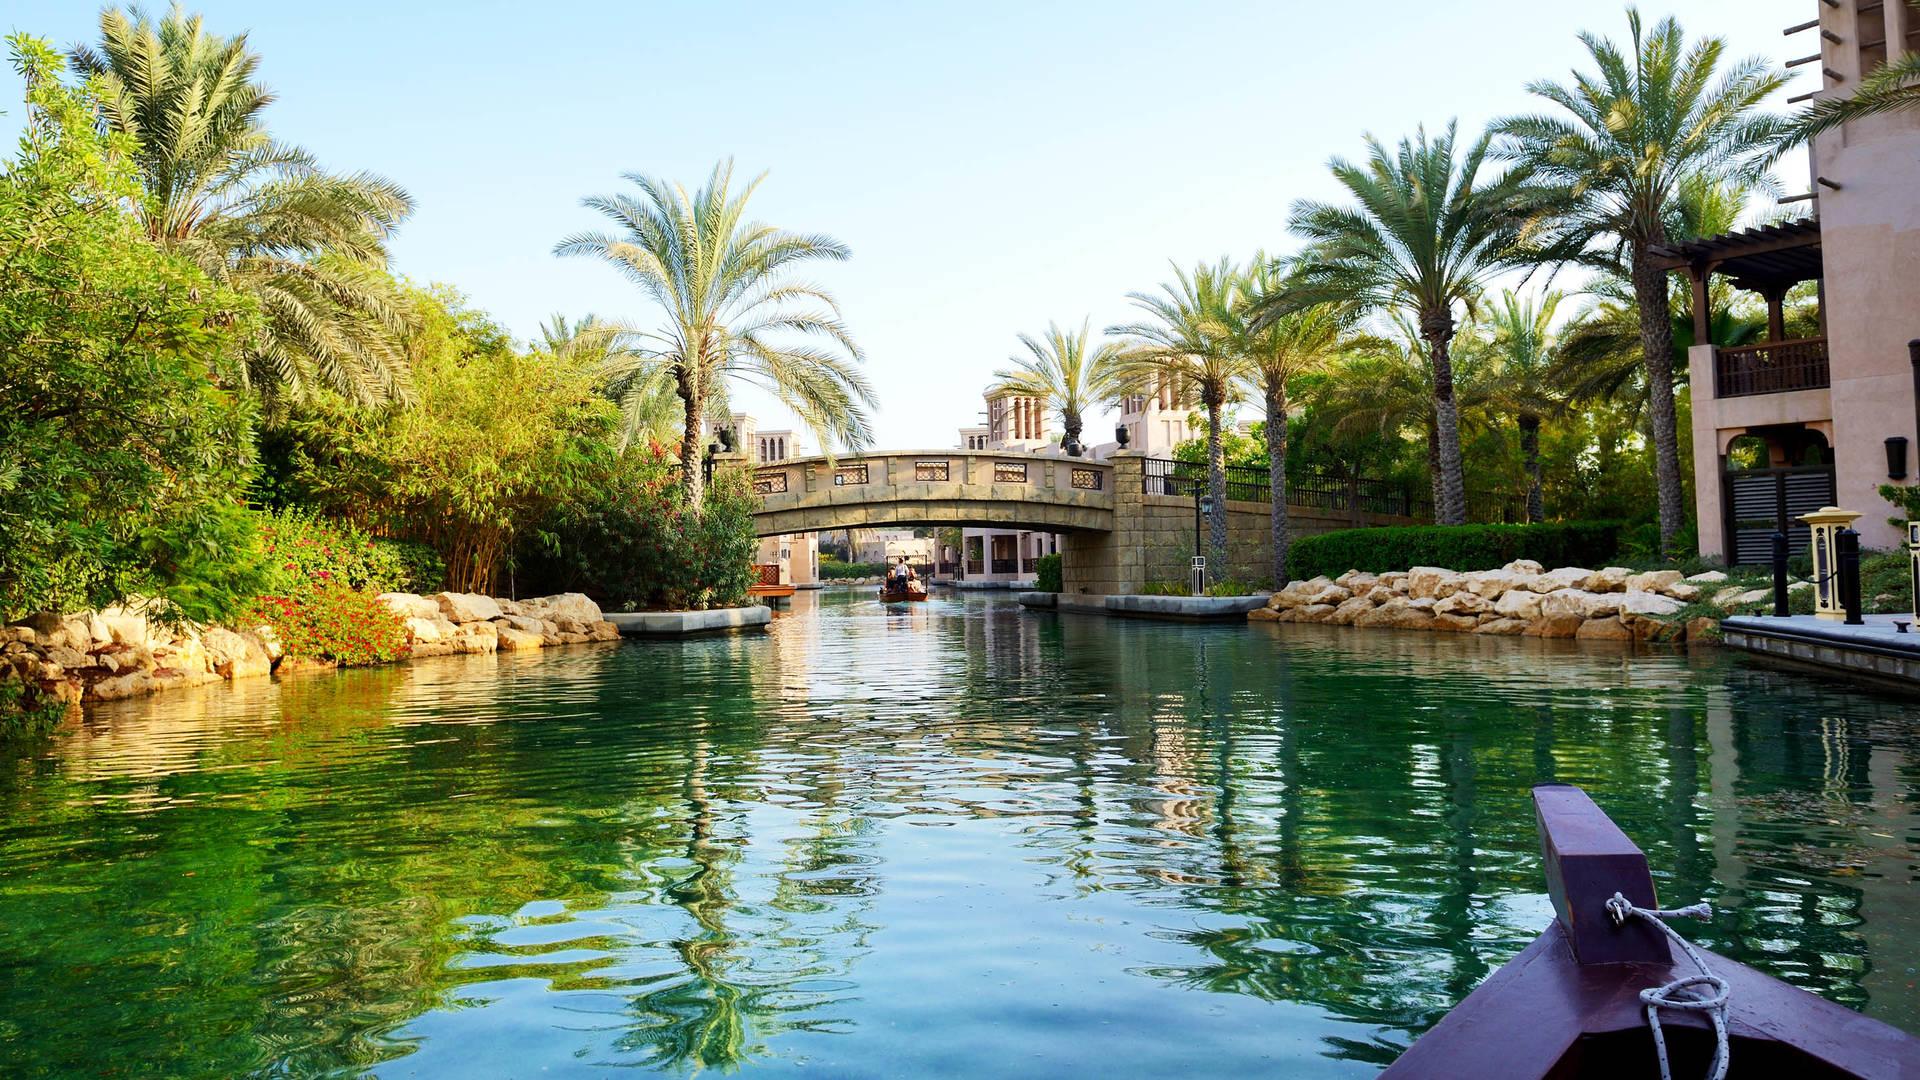 waterways and abra boat at Souk Madinat Jumeirah Dubai Istock